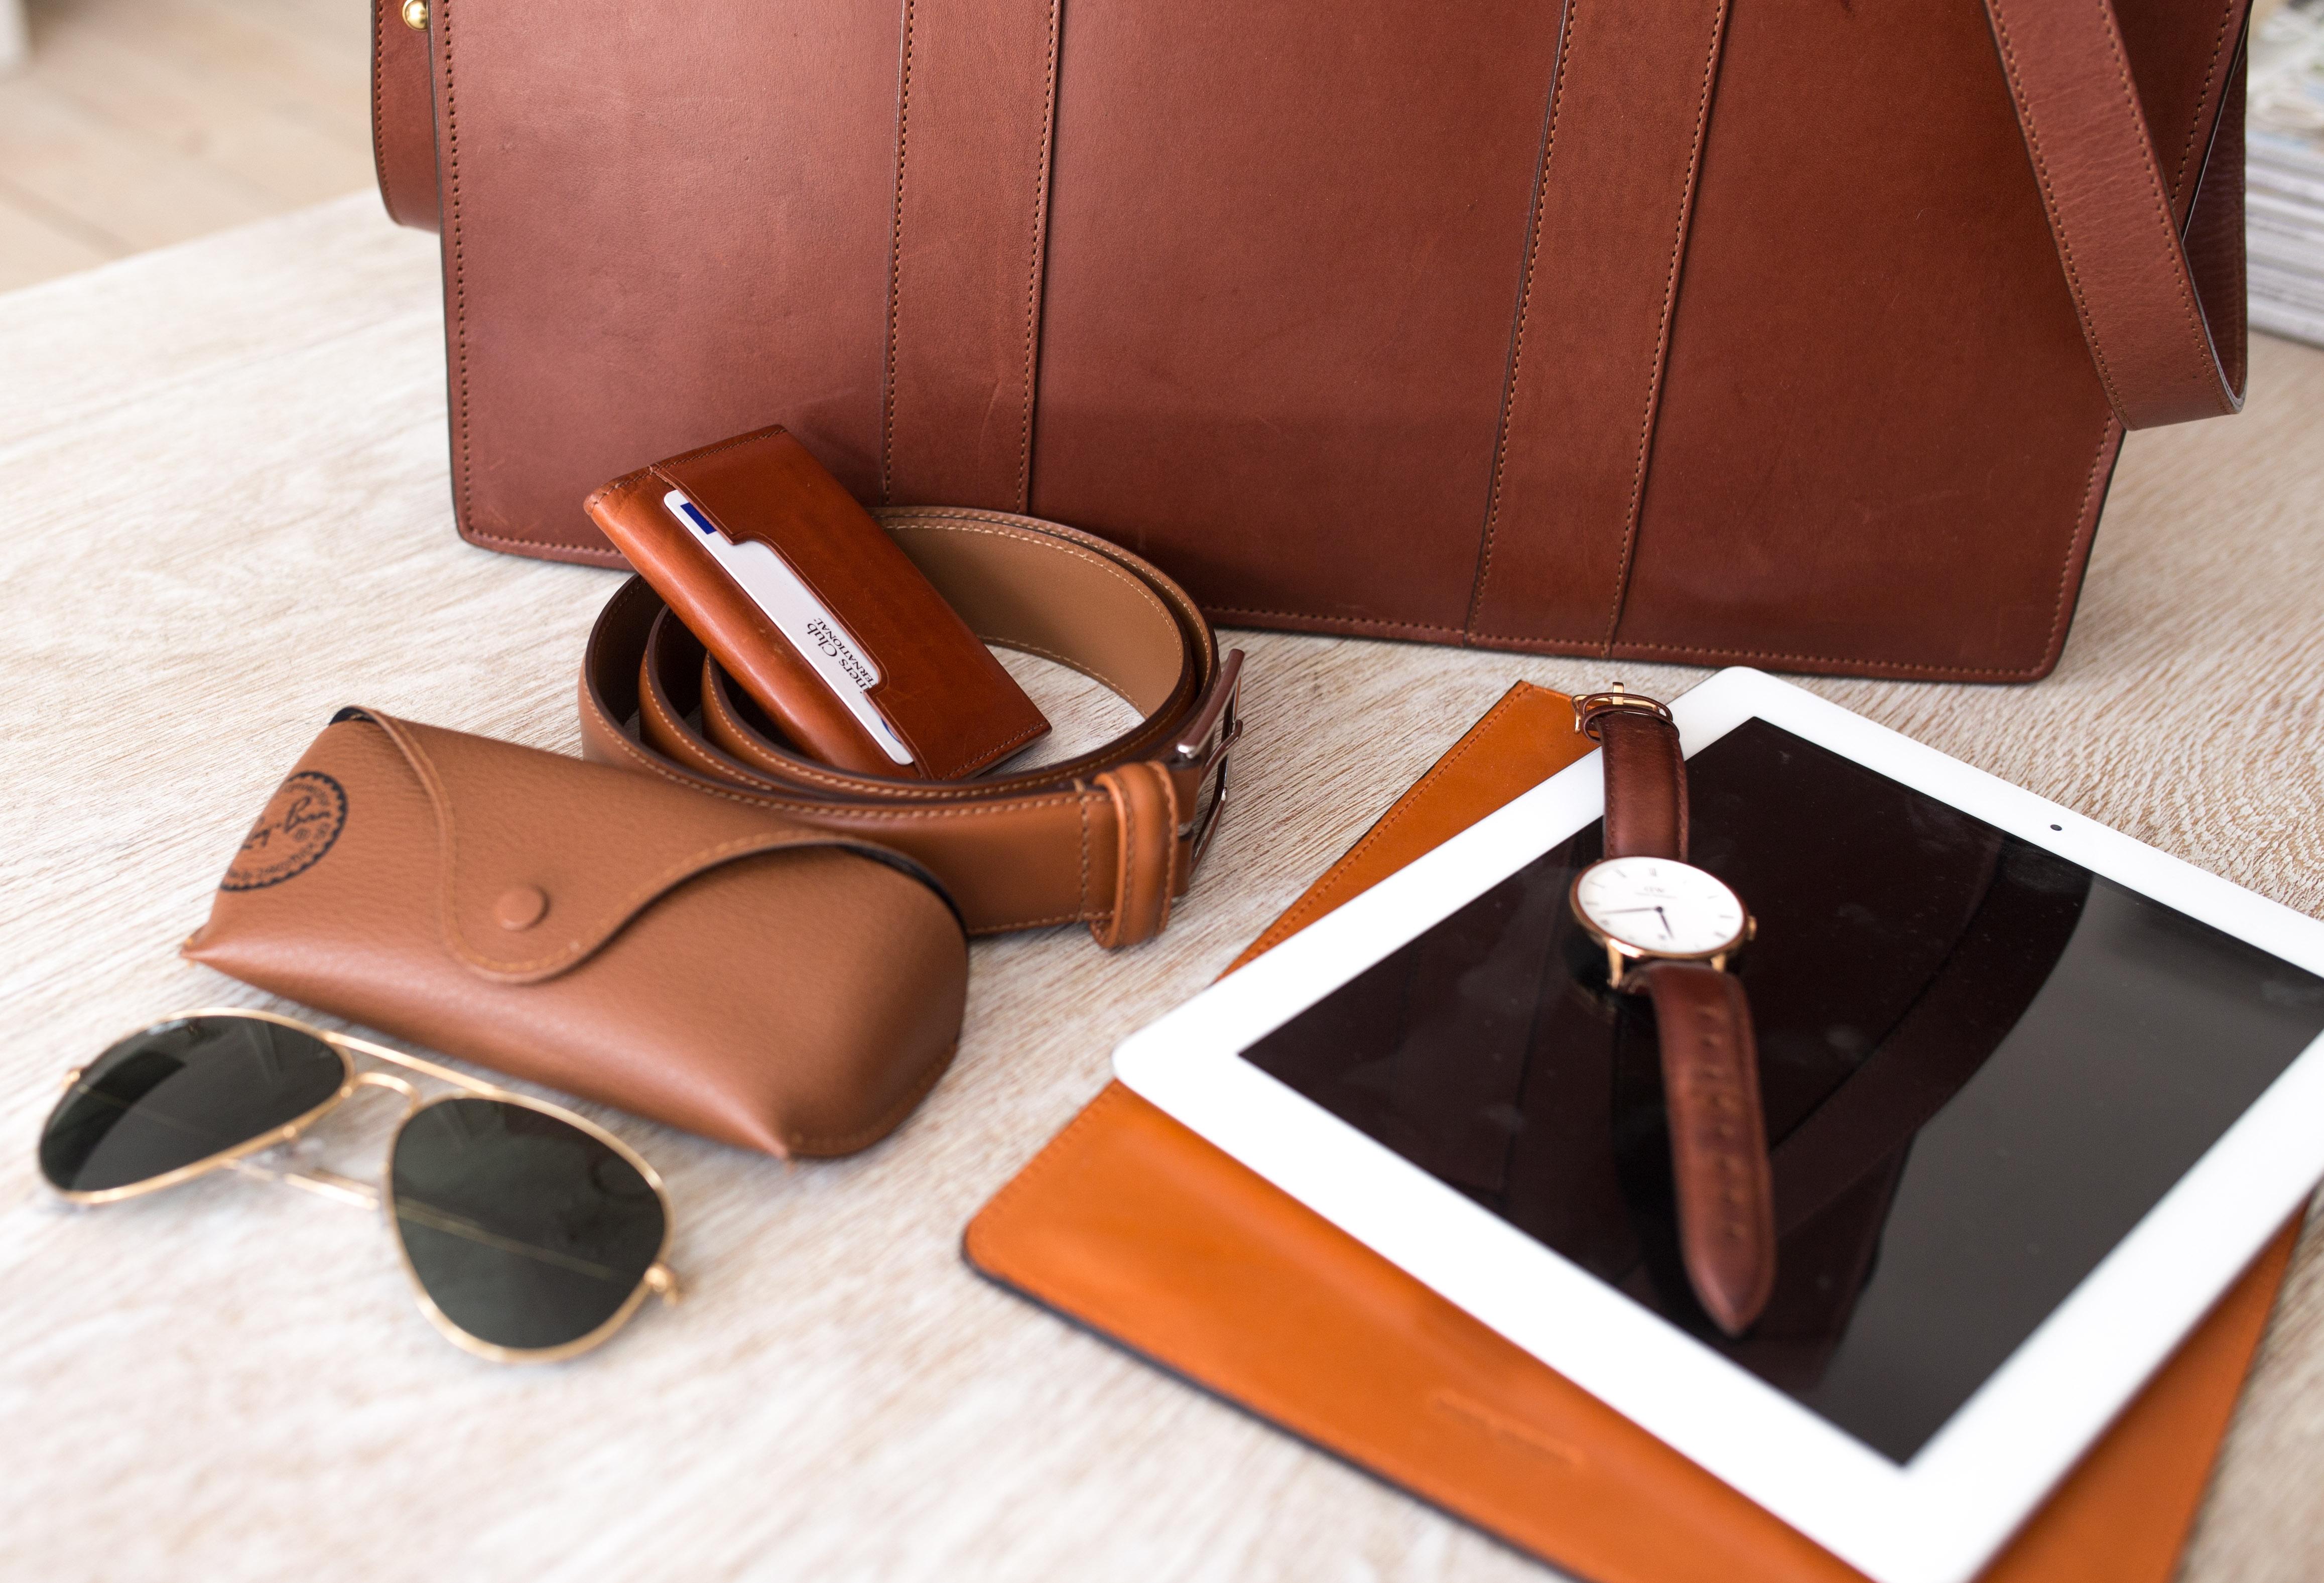 Review: Oppermann Swanfield Cognac Wallet